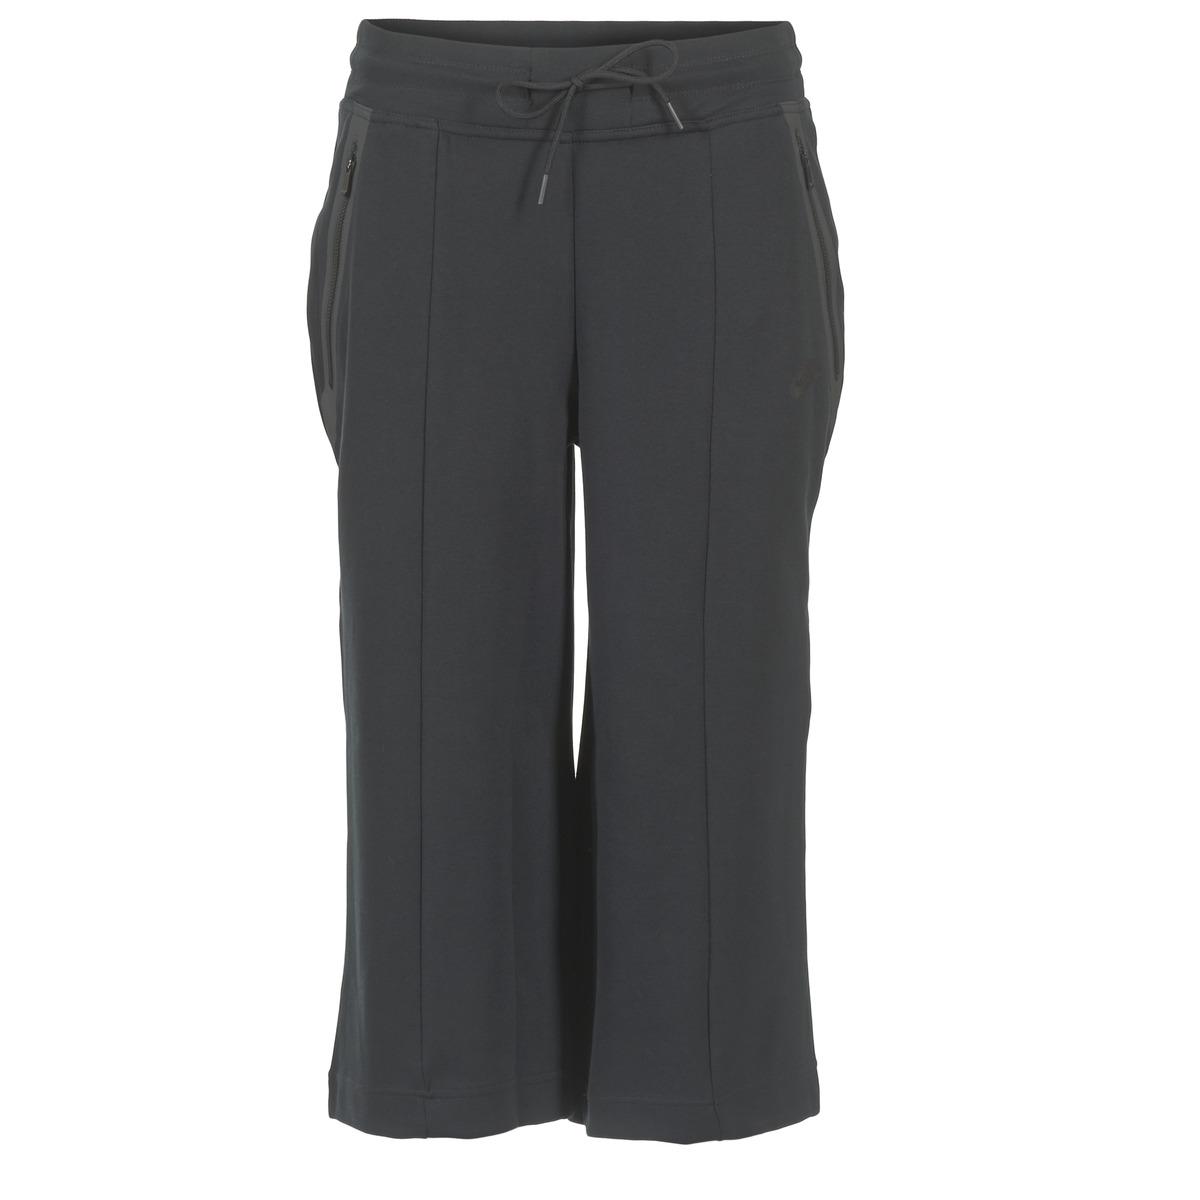 Joggings / Survêtements Nike TECH FLEECE CAPRI Noir